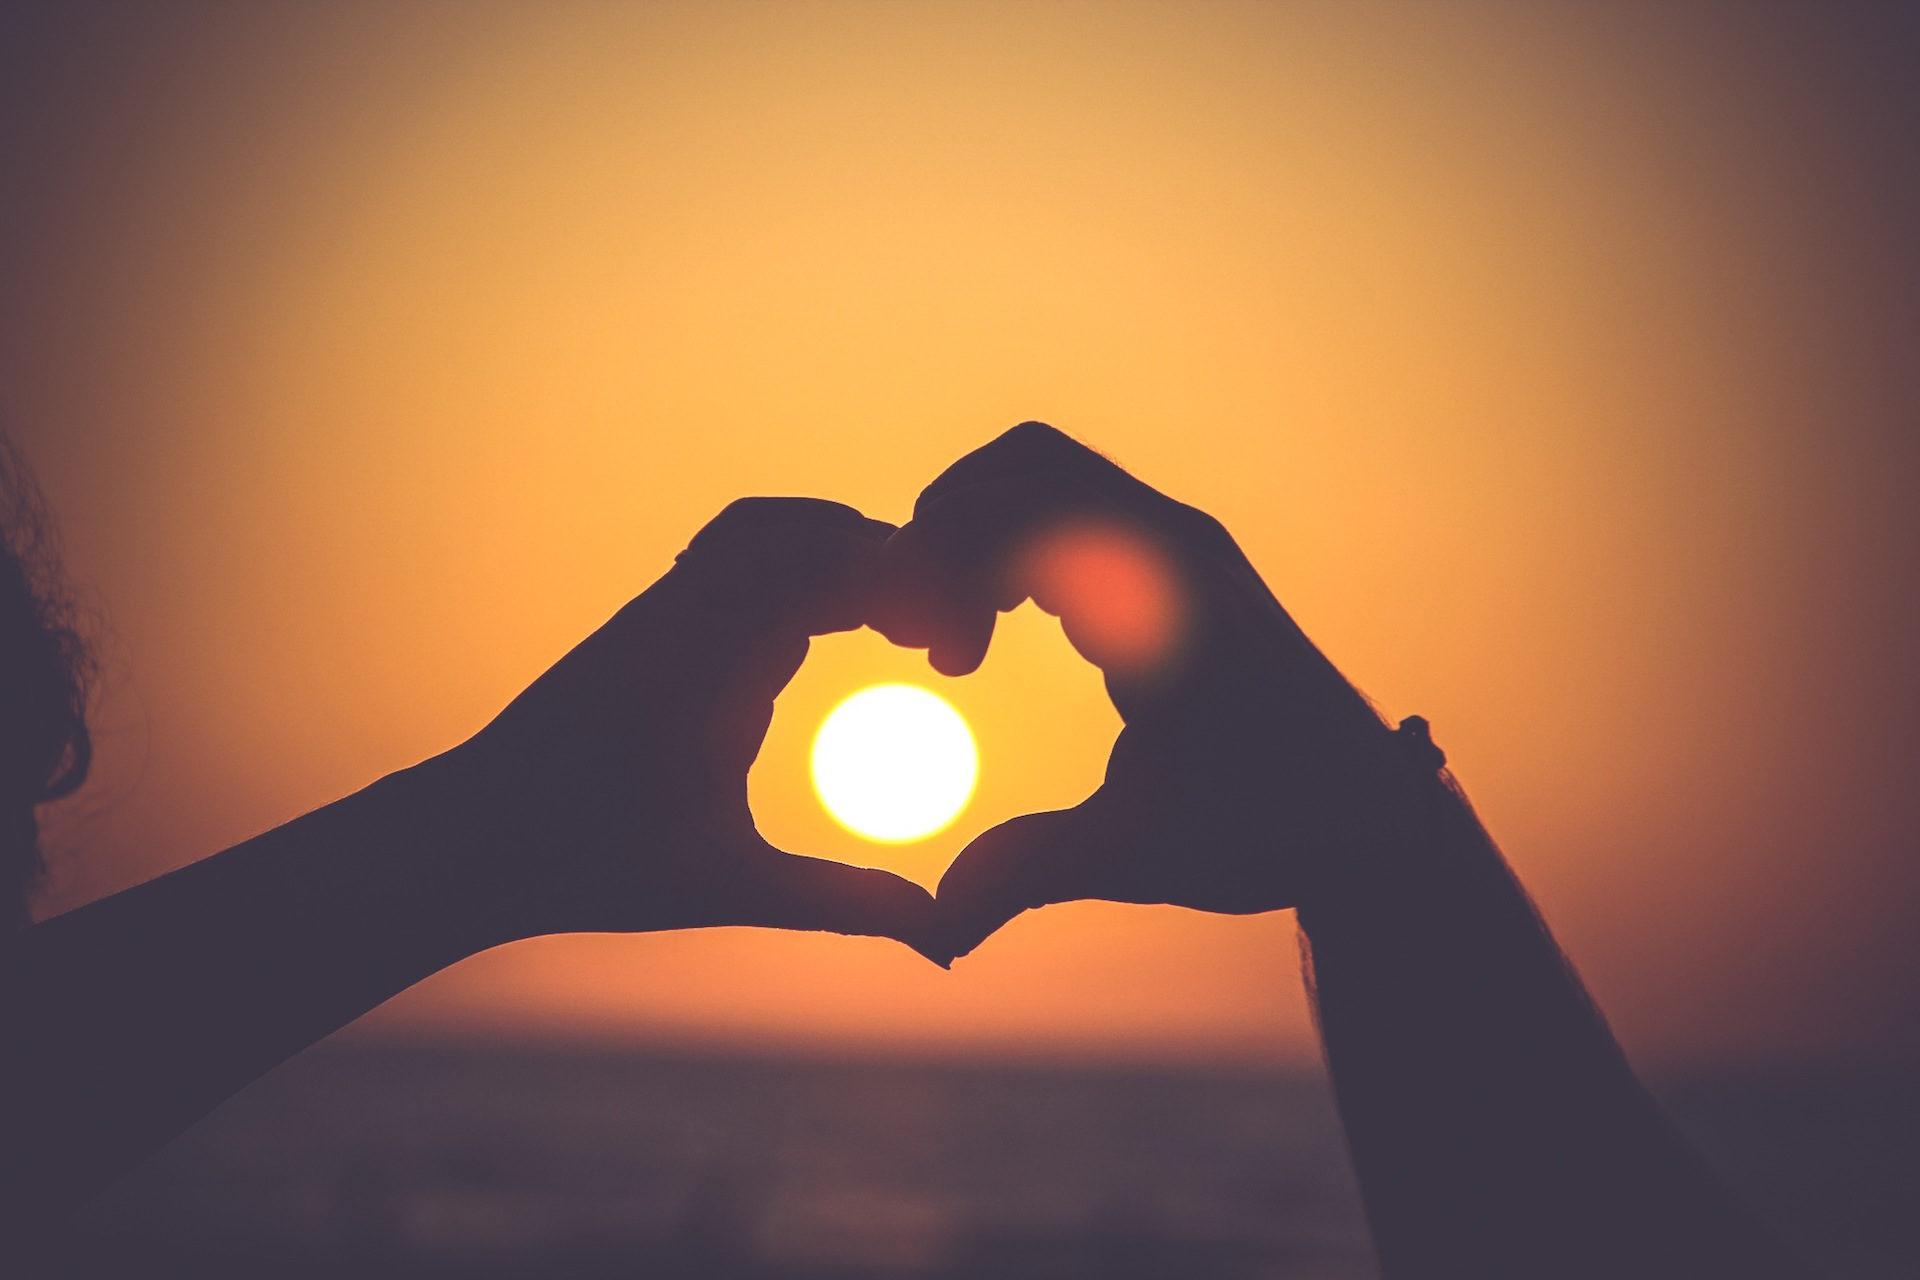 manos, formas, corazón, sol, atardecer - Fondos de Pantalla HD - professor-falken.com